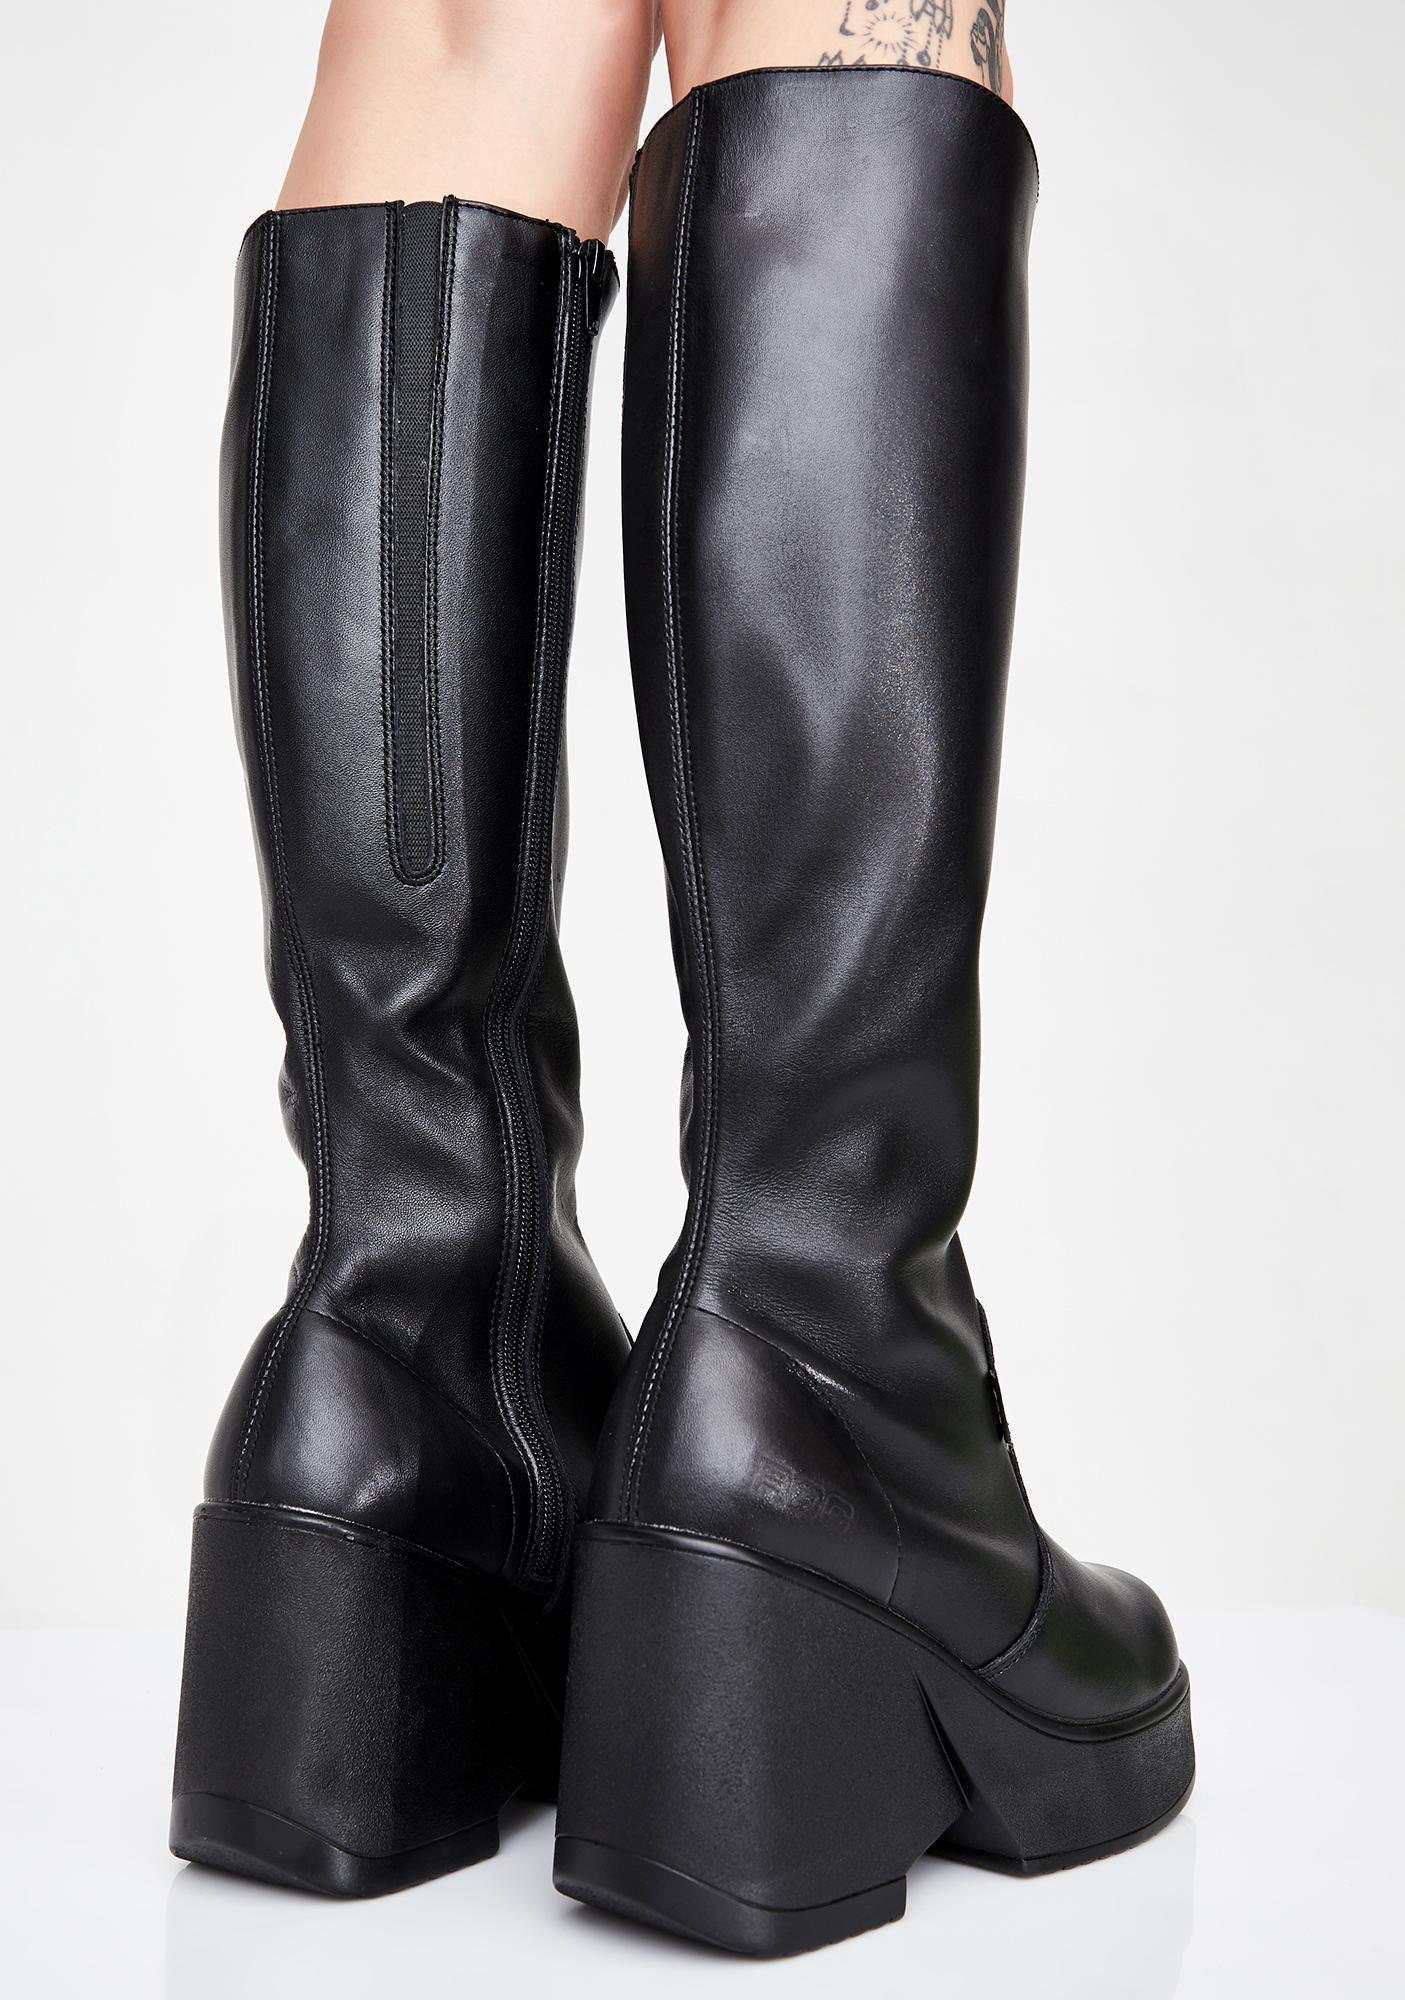 ROC Boots Australia Pharaoh Wedge Boots